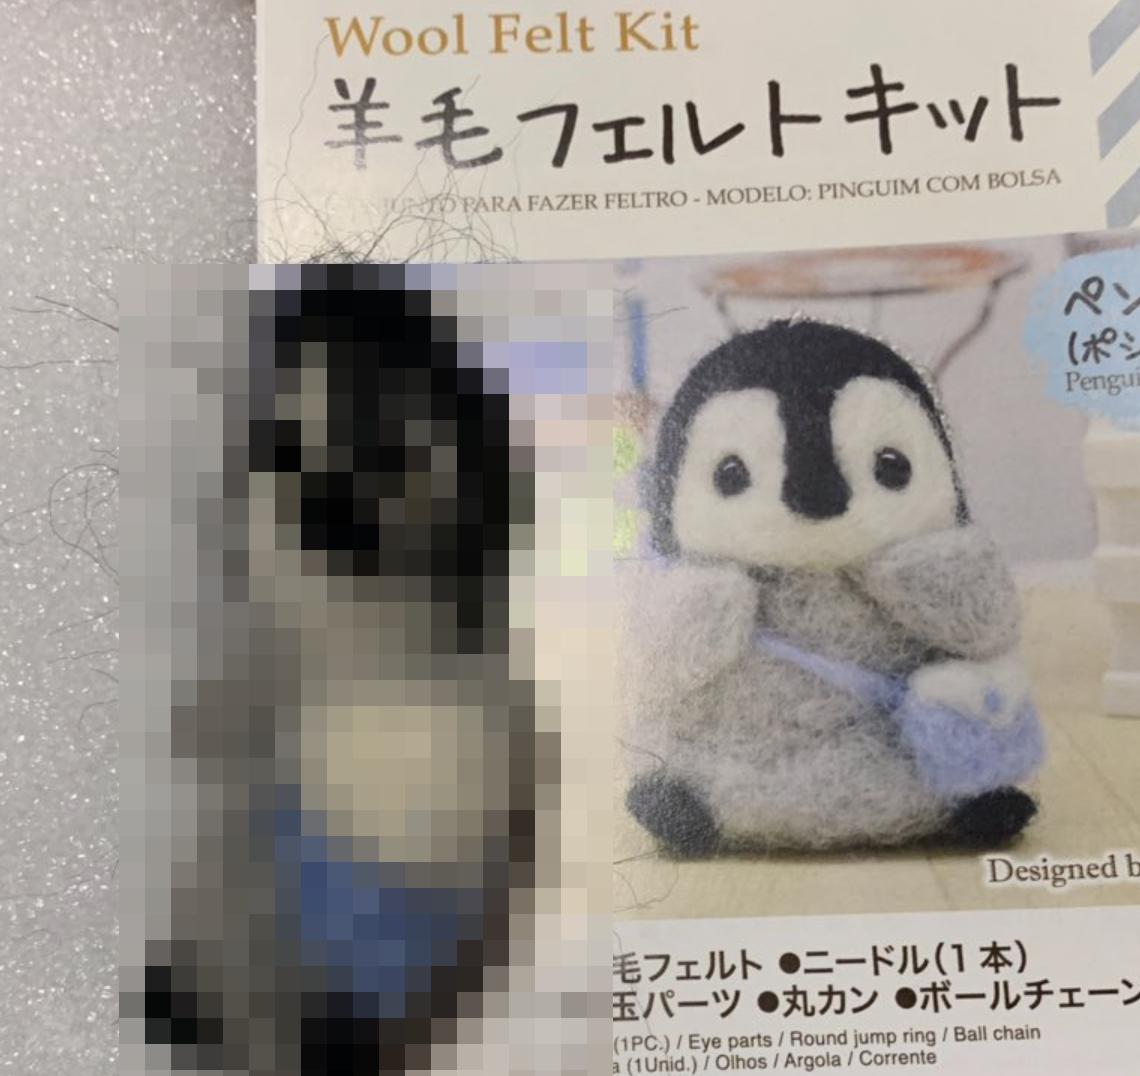 f:id:PEN-teru:20190621002934p:plain